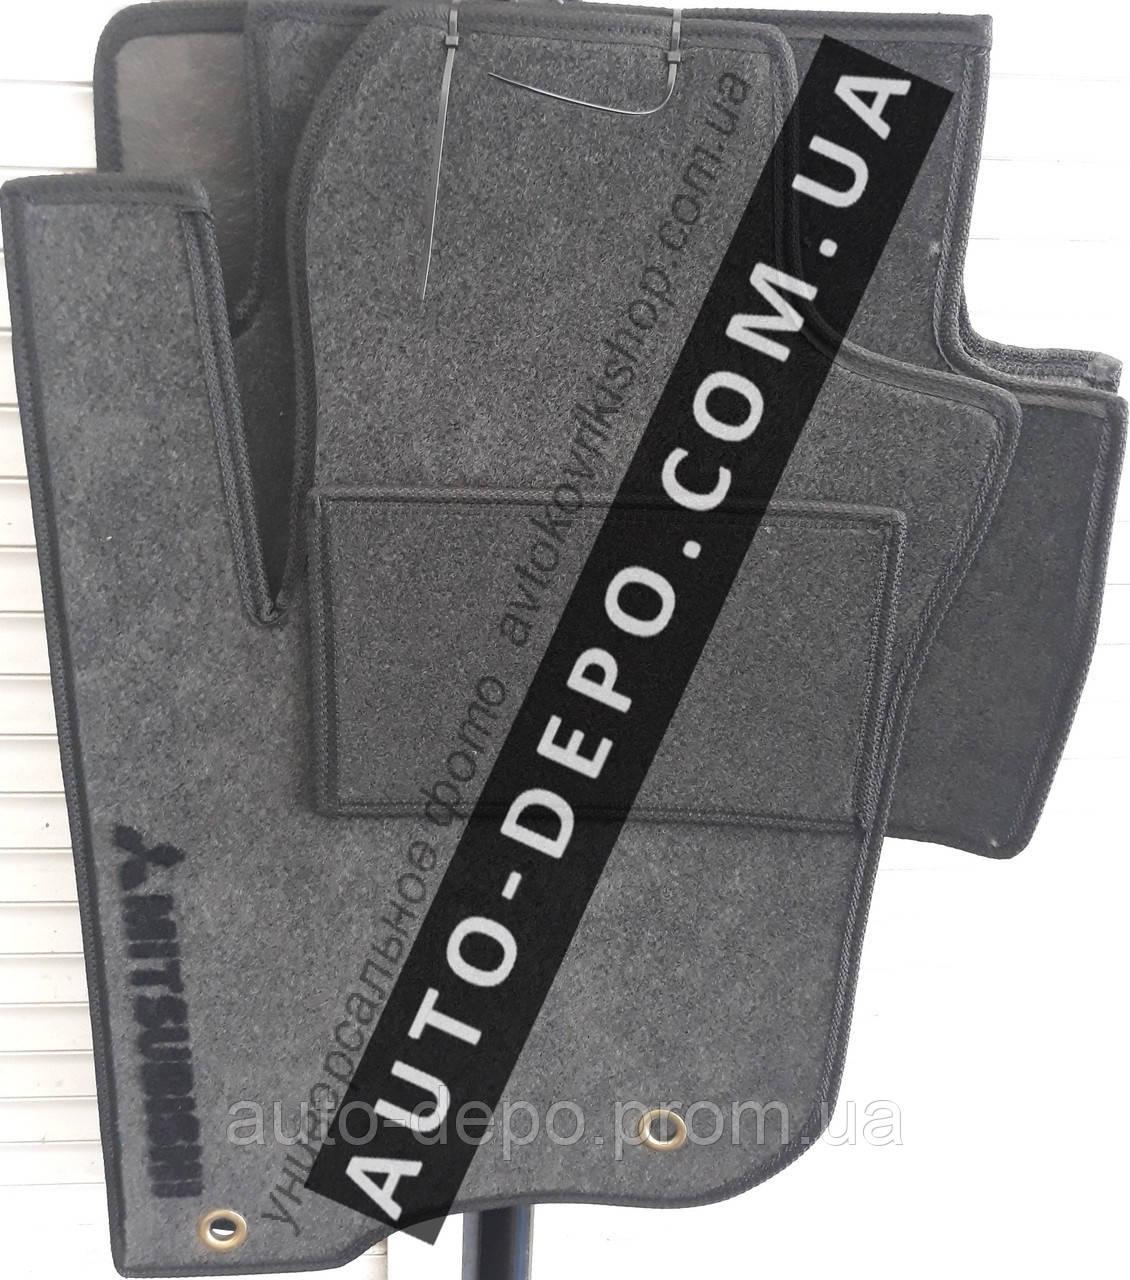 Ворсовые коврики Mitsubishi Colt 2009- VIP ЛЮКС АВТО-ВОРС